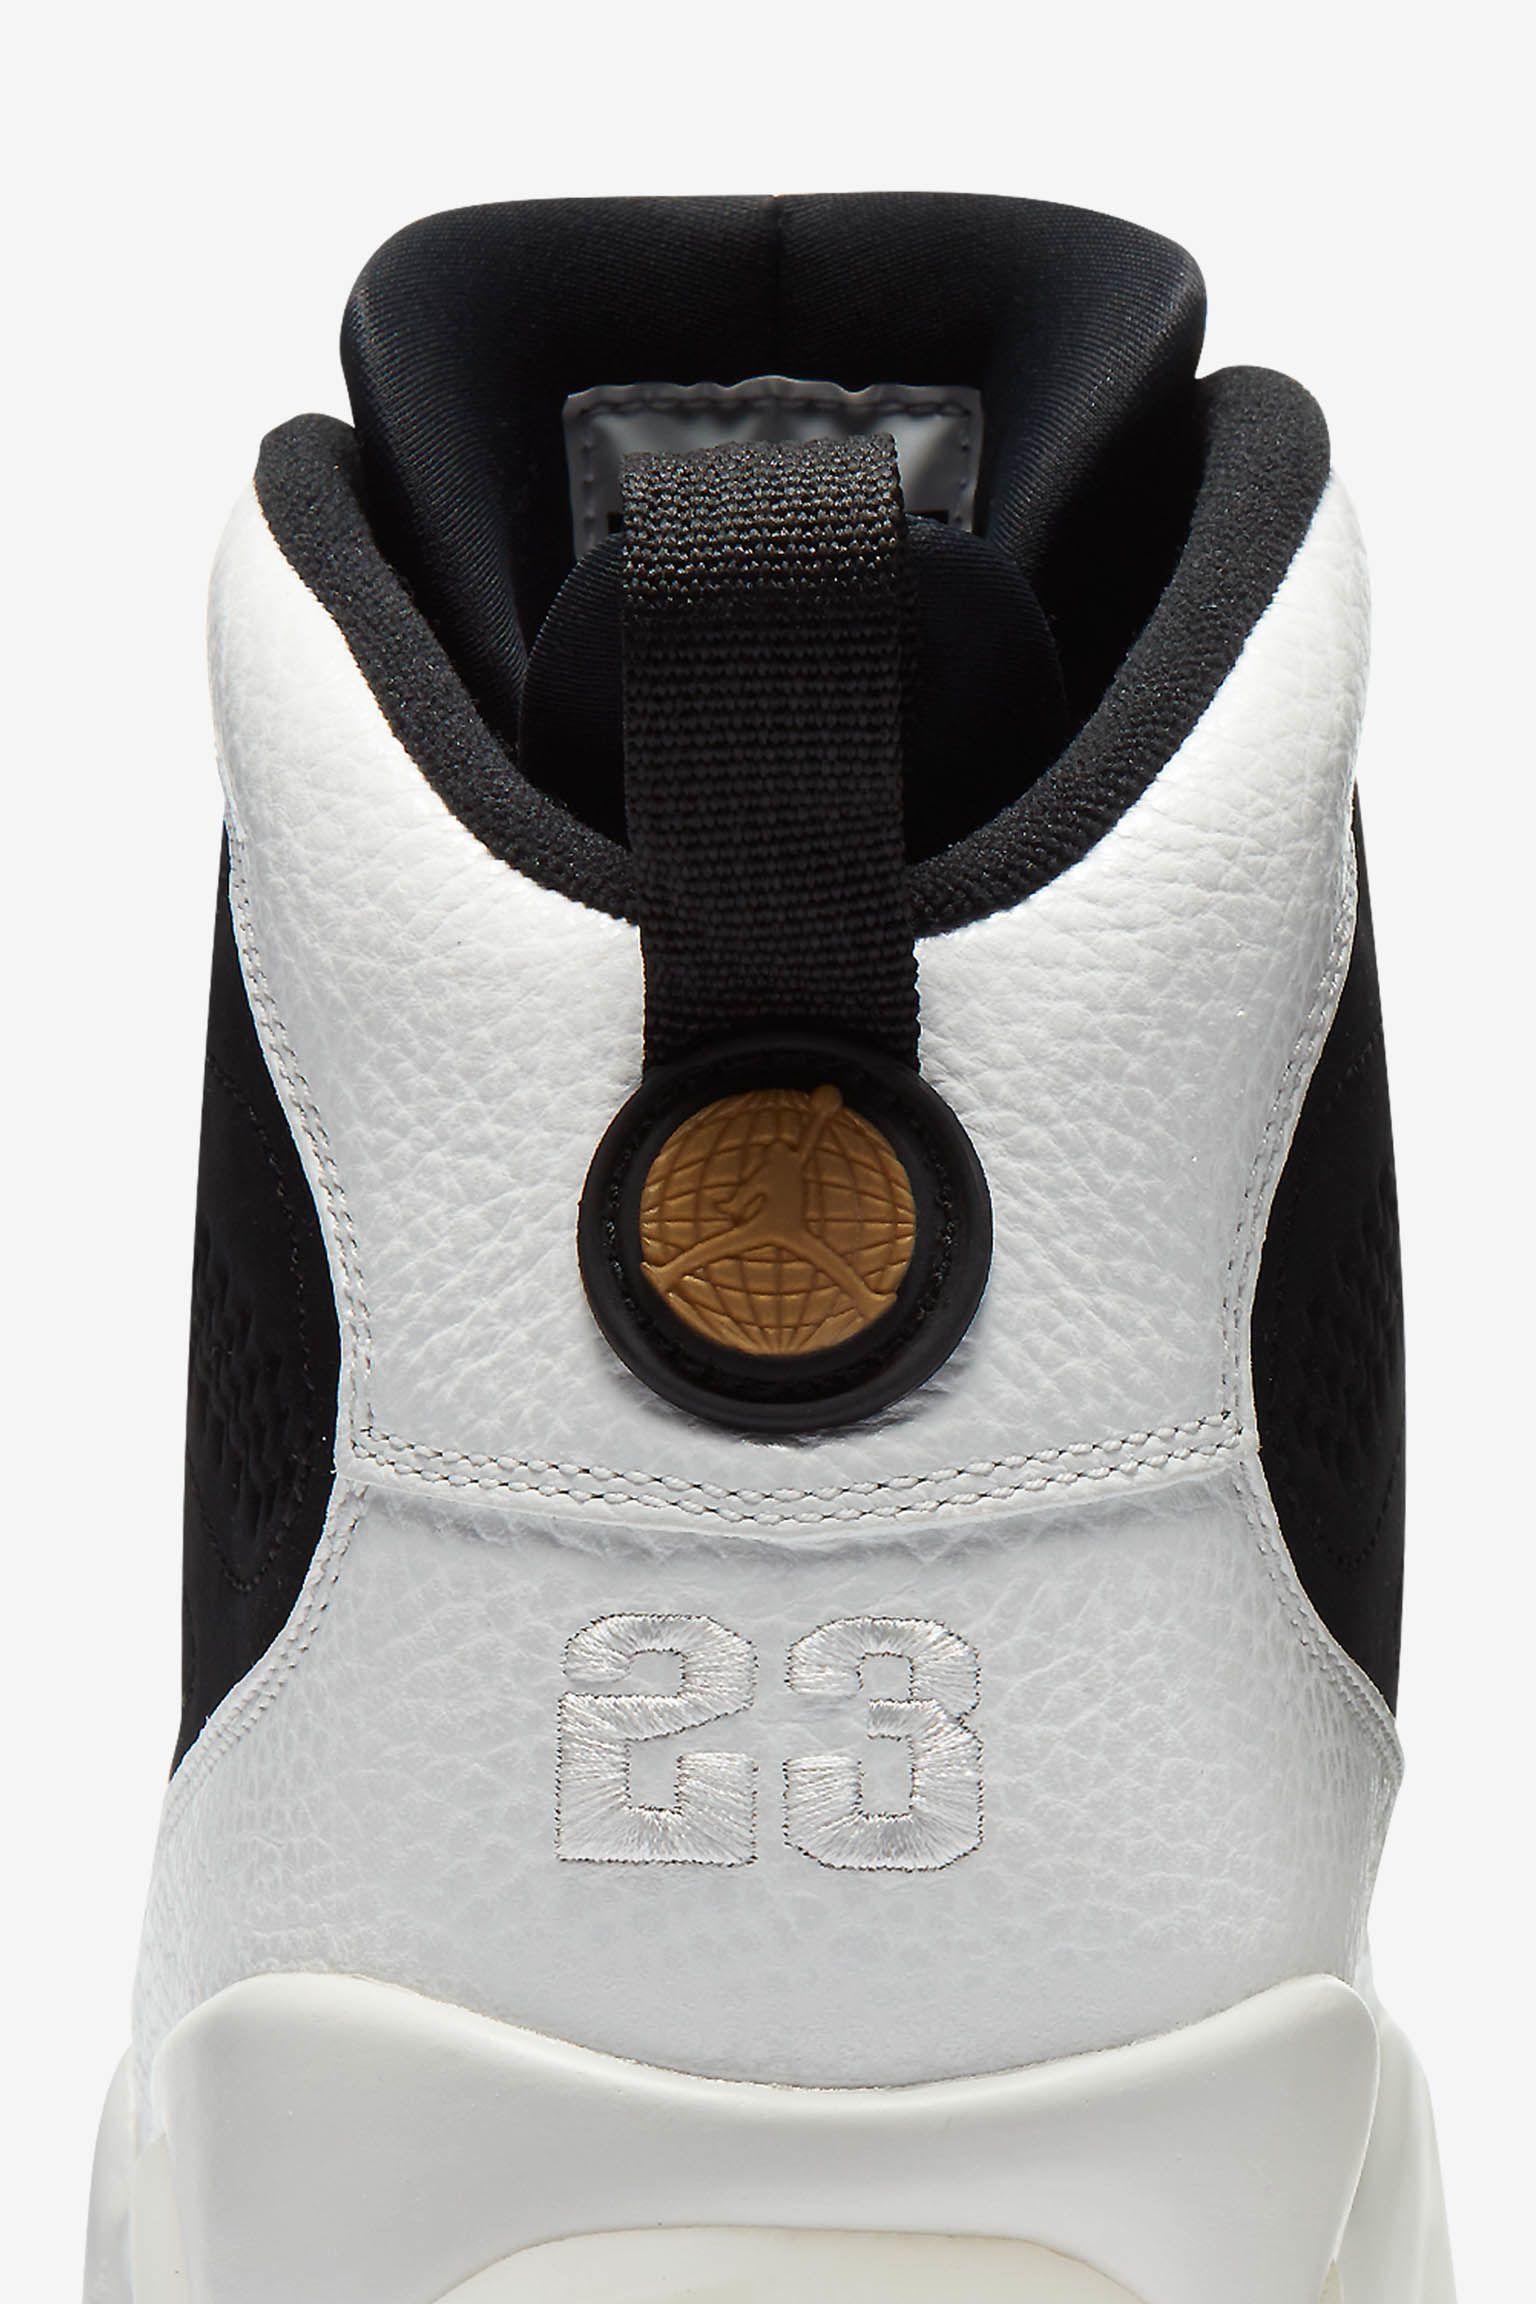 Air Jordan 9 'City of Flight' Release Date